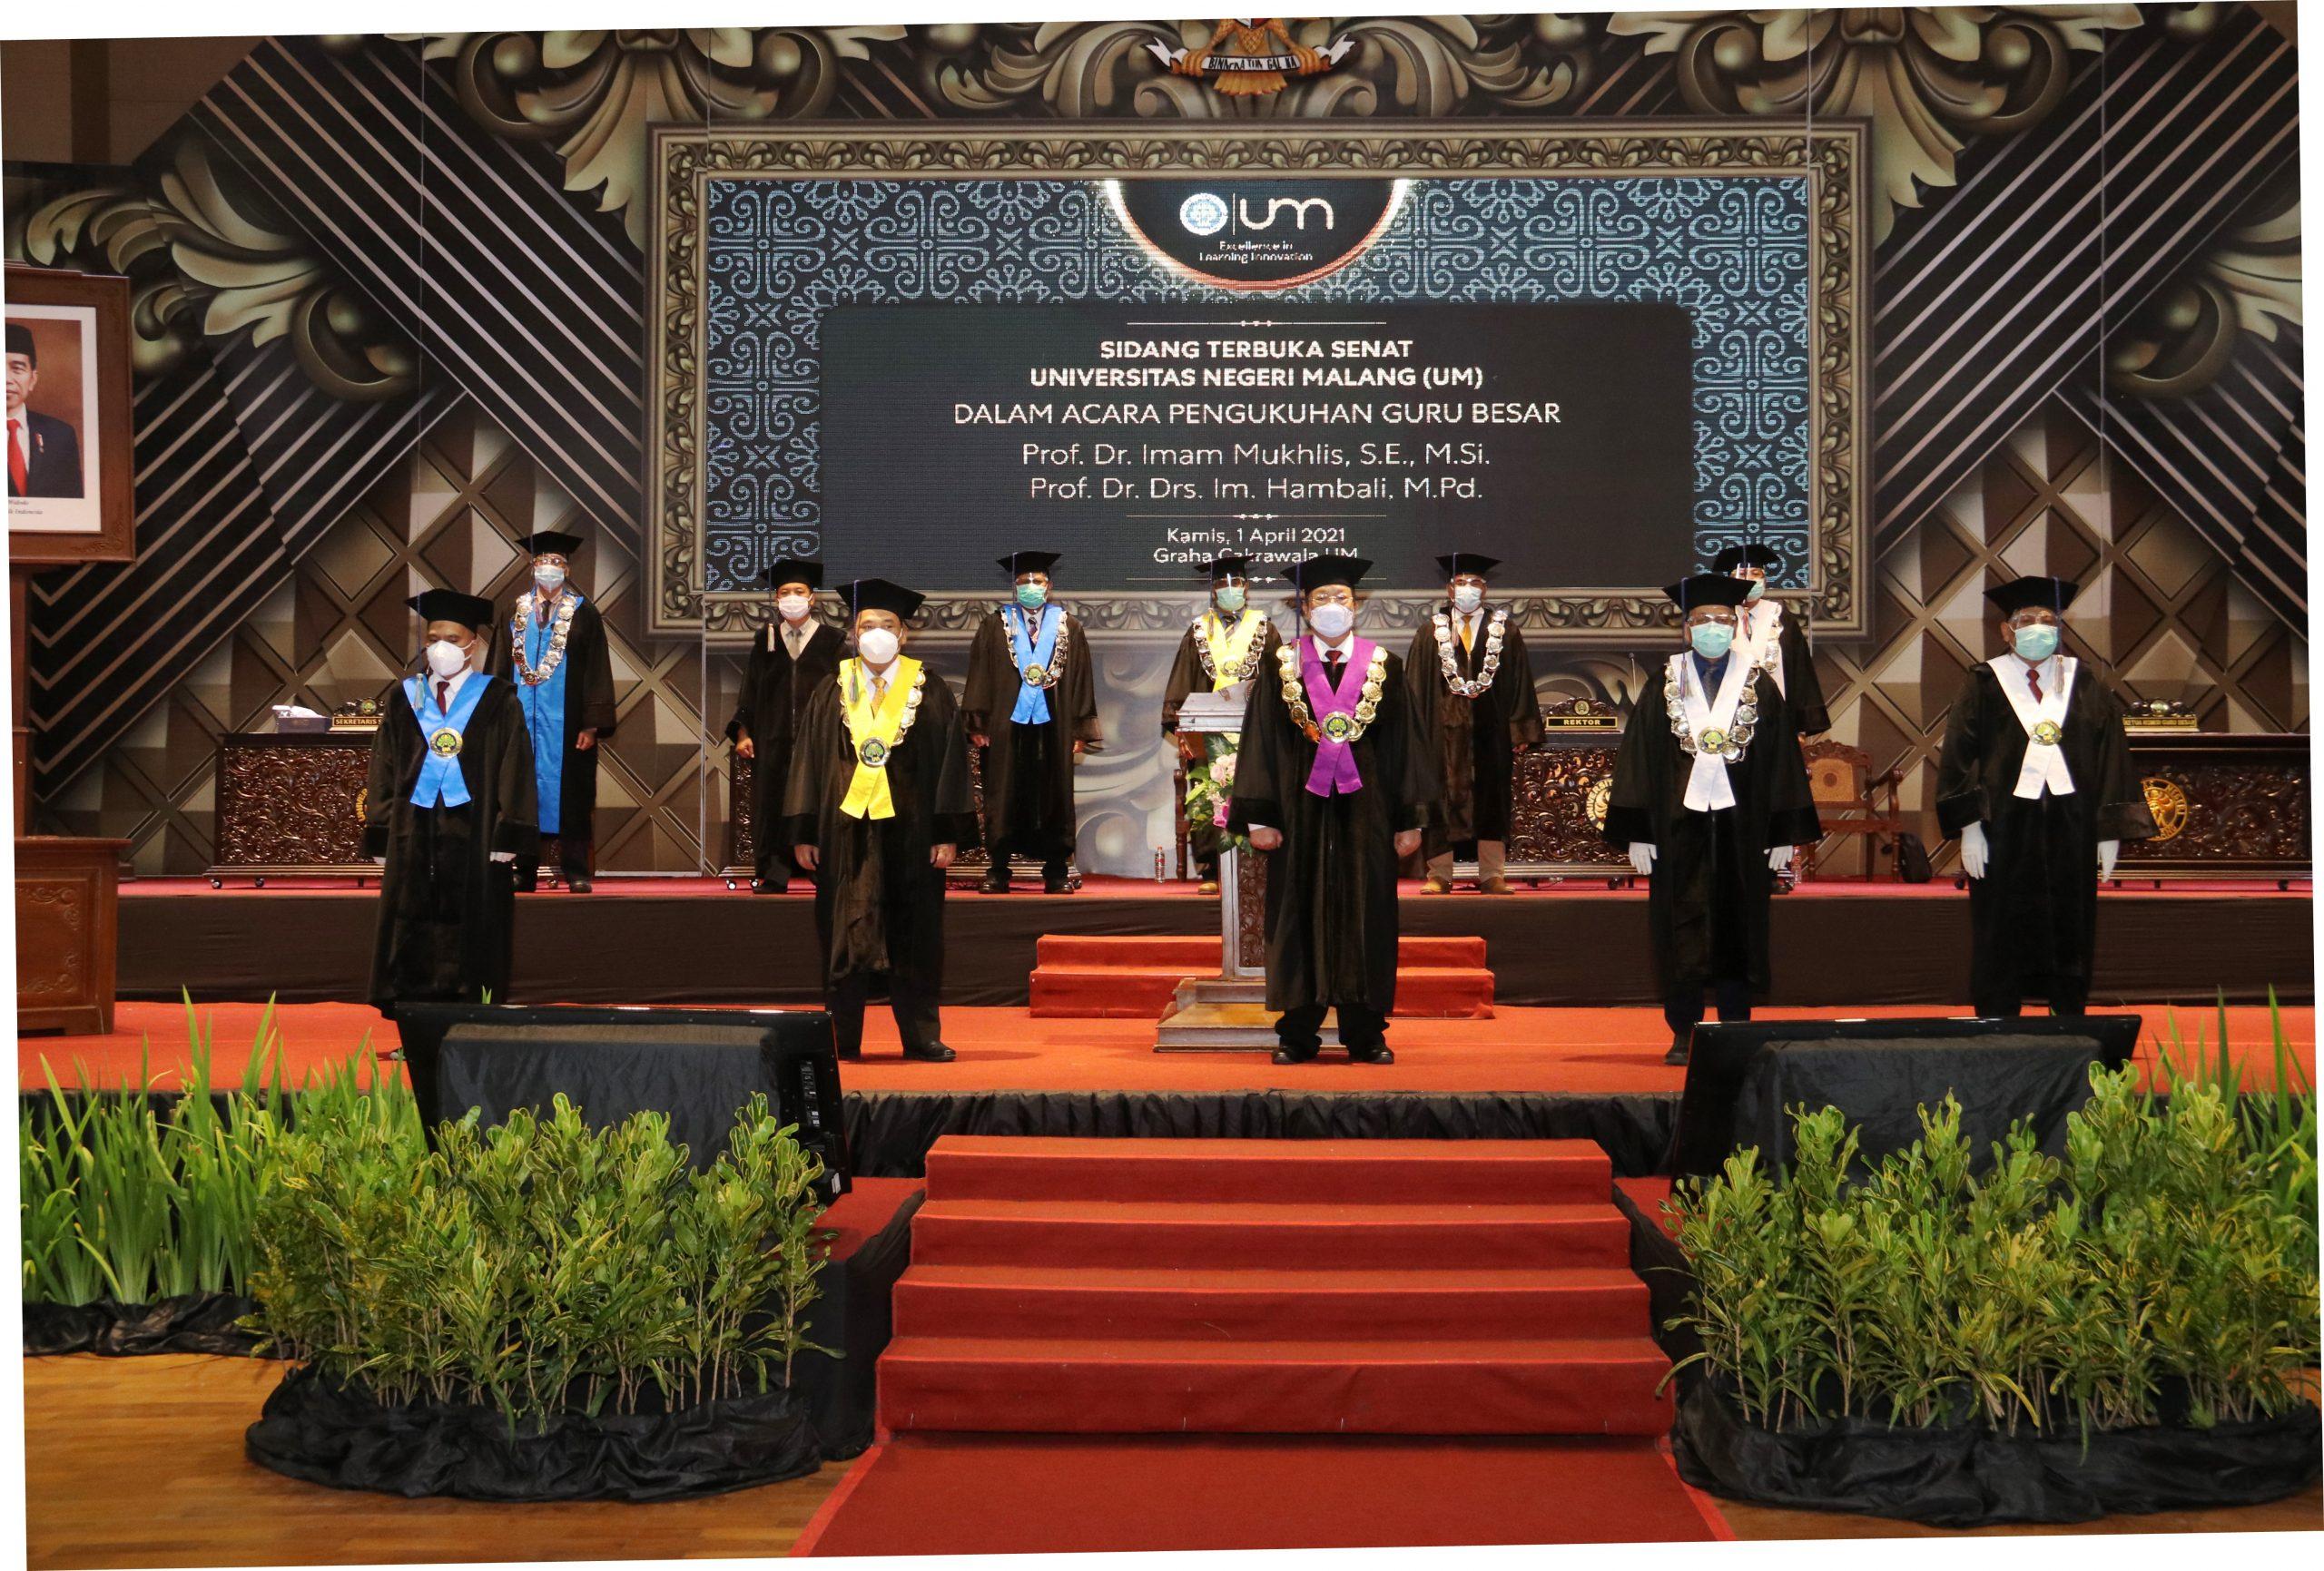 Photo of Dokumentasi Pengukuhan Dua Guru Besar Universitas Negeri Malang (UM) Prof. Dr. Imam Mukhlis, S.E., M.Si dan Prof. Dr. IM Hambali, M.Pd